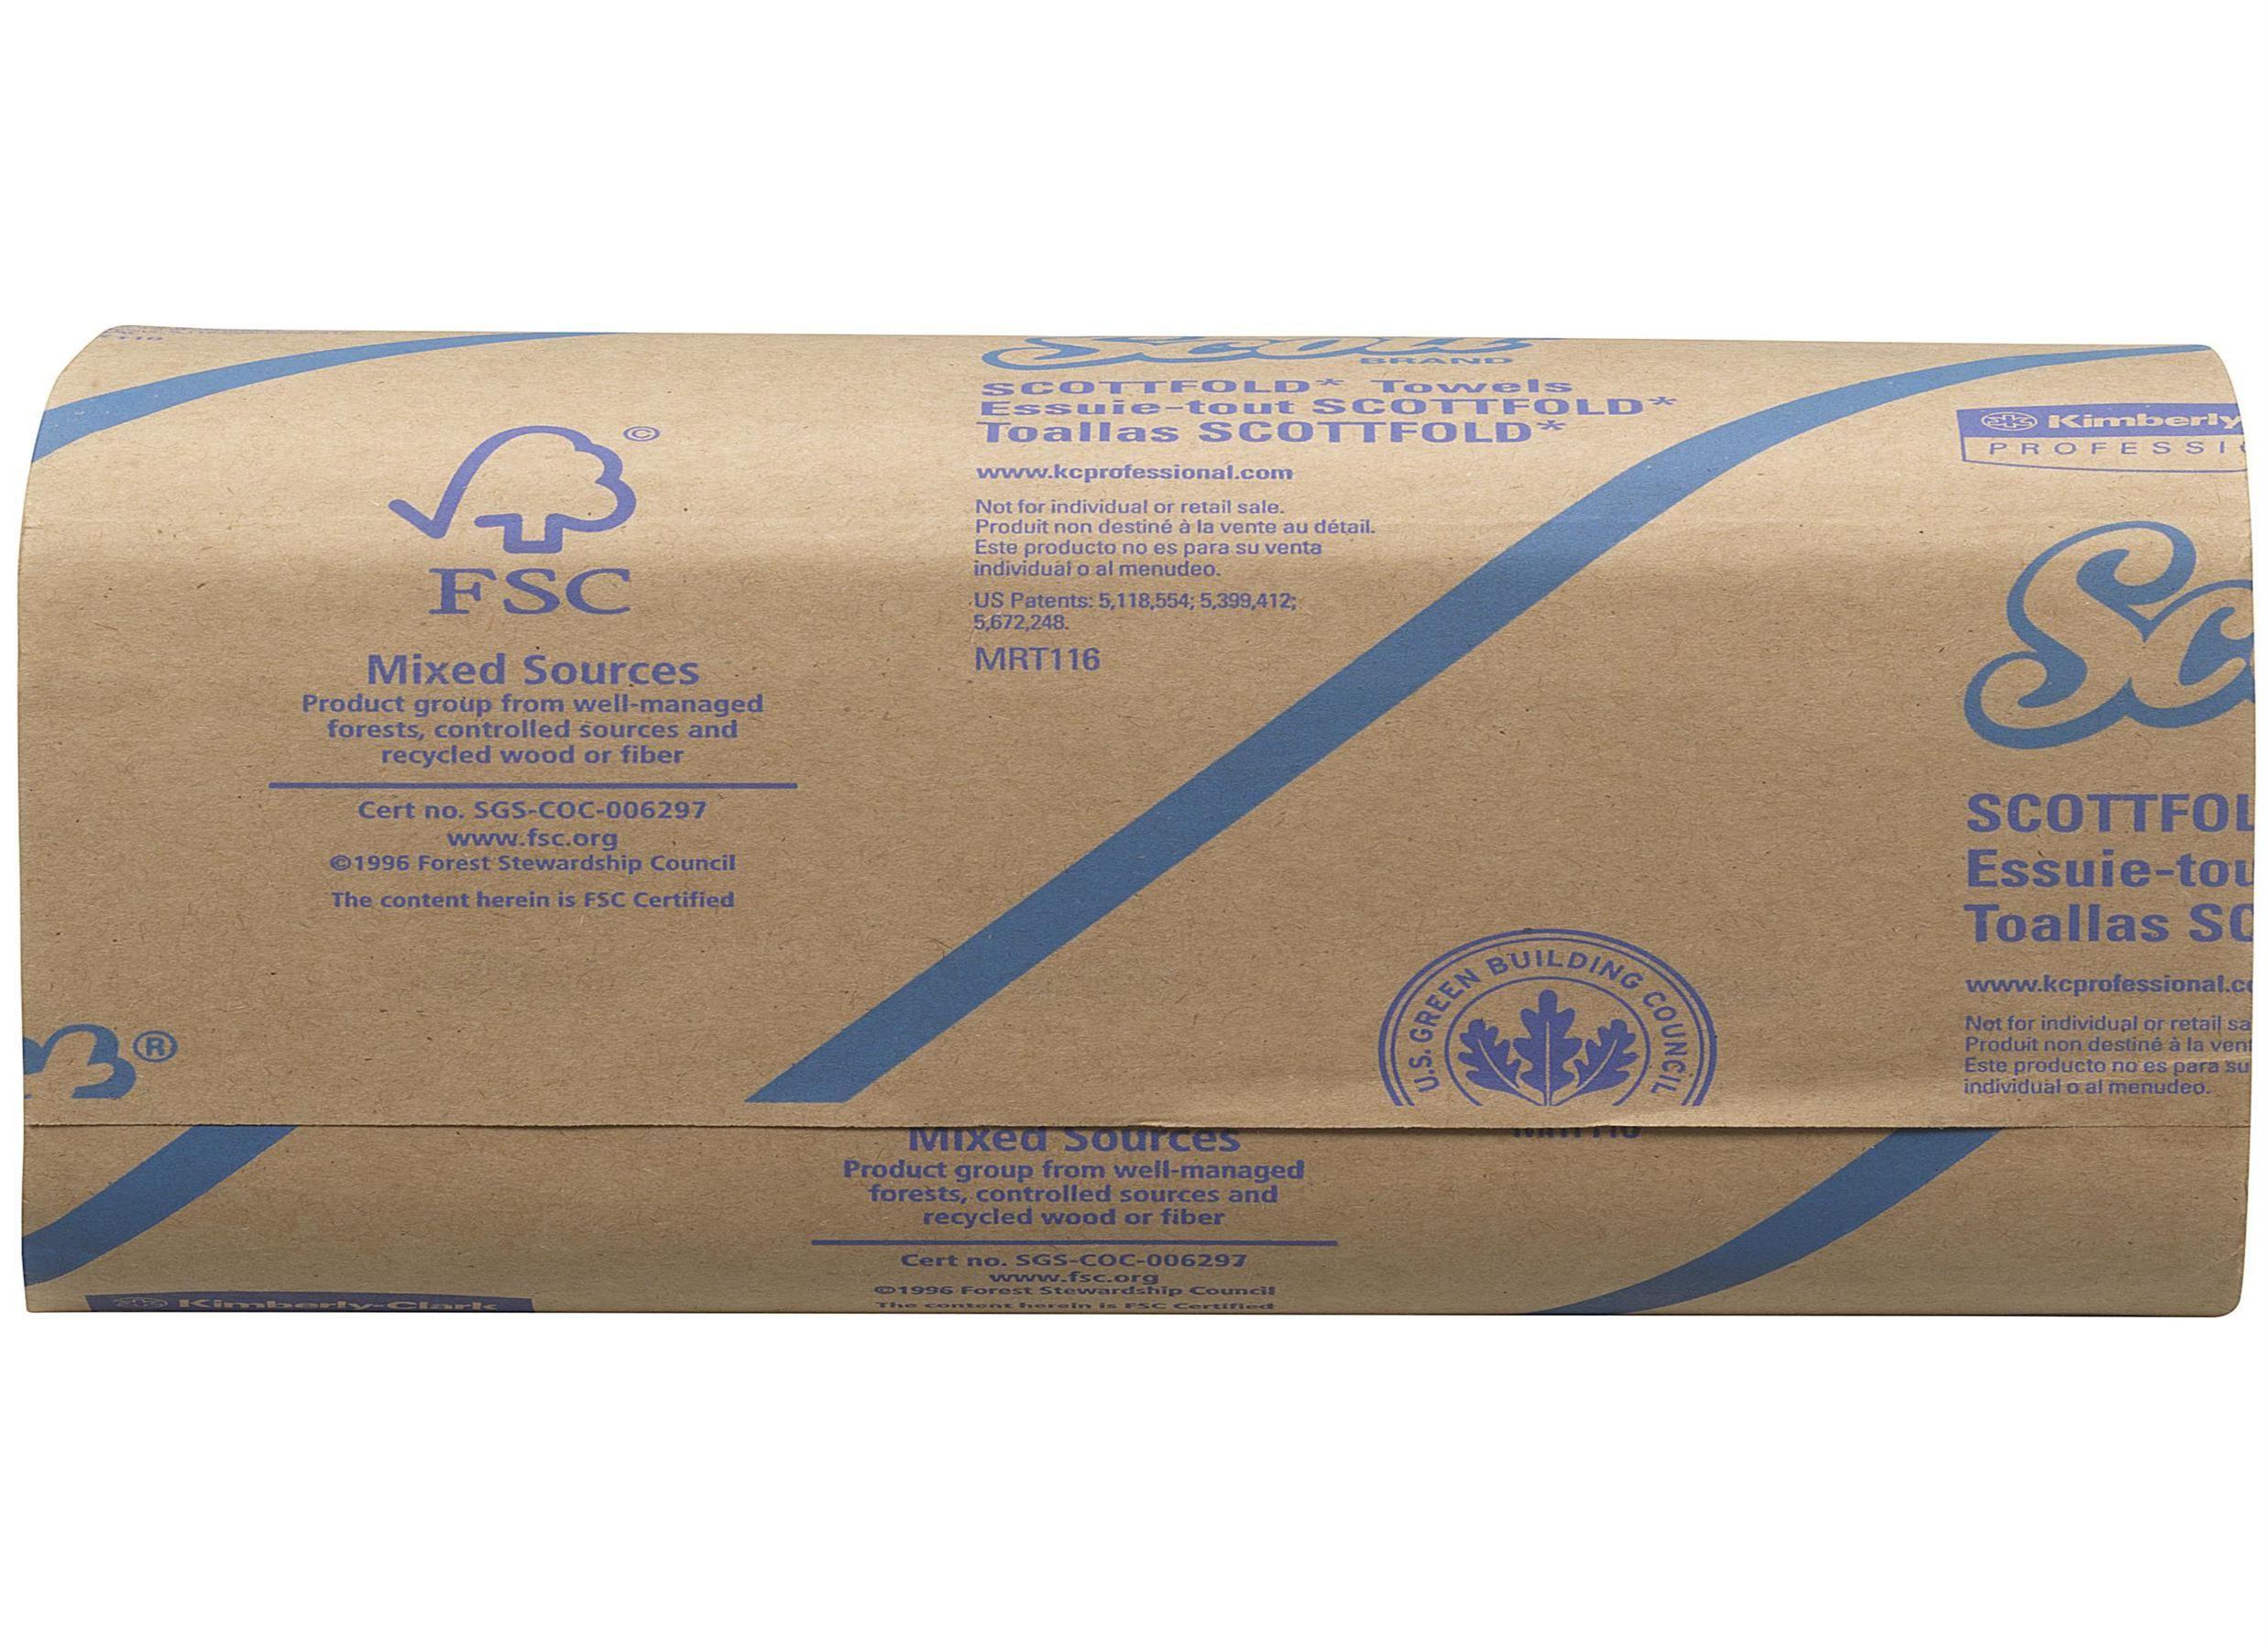 Scott Scottfold Hand Towels 175 Towels per Sleeve Ref 6633 [Pack 25 Sleeves]